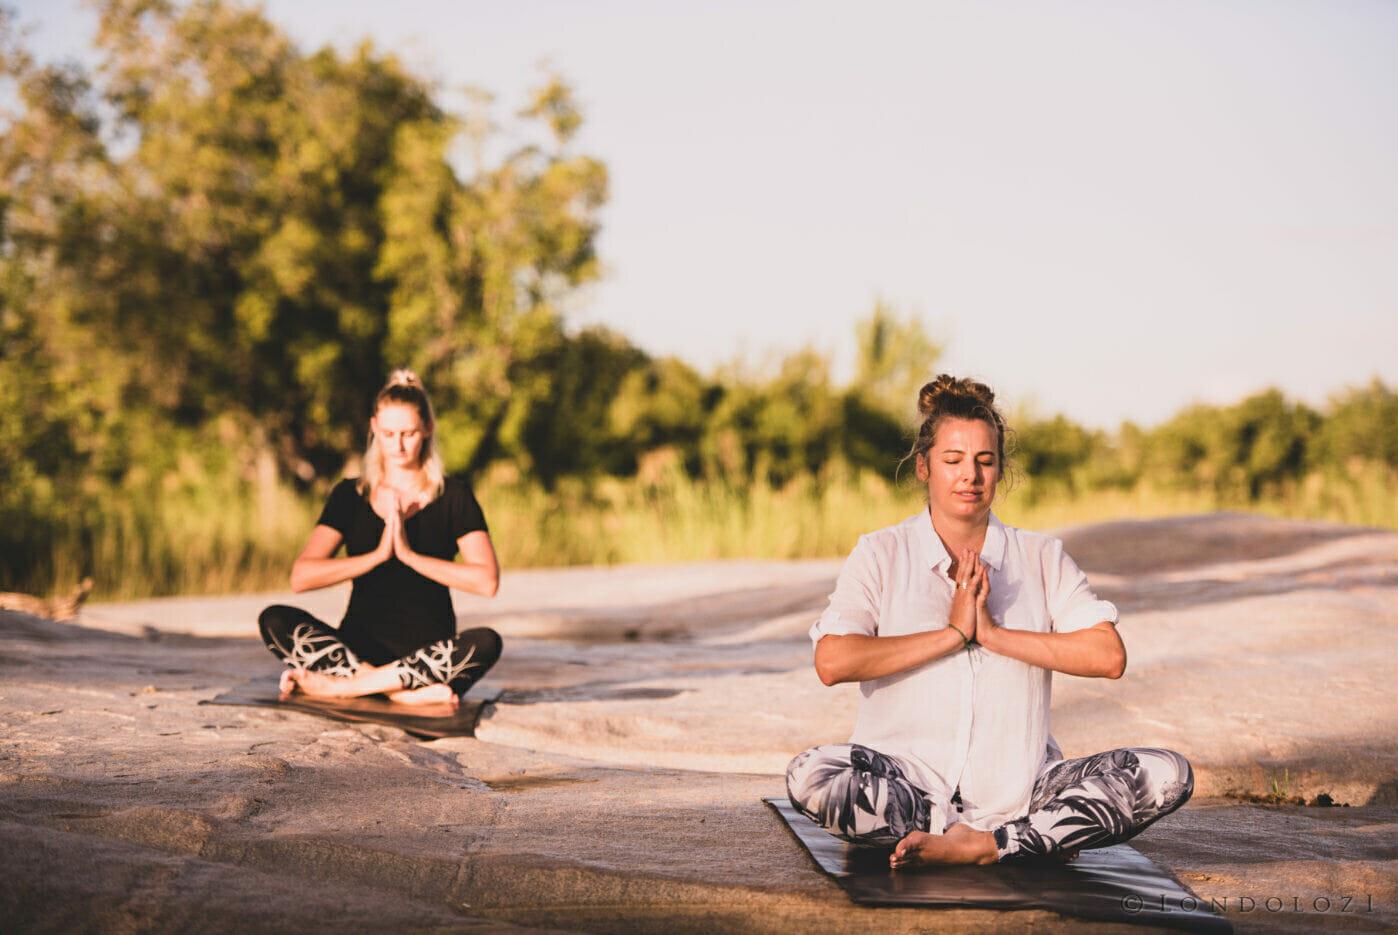 Londolozi Yoga Wild A Ritchie 1602